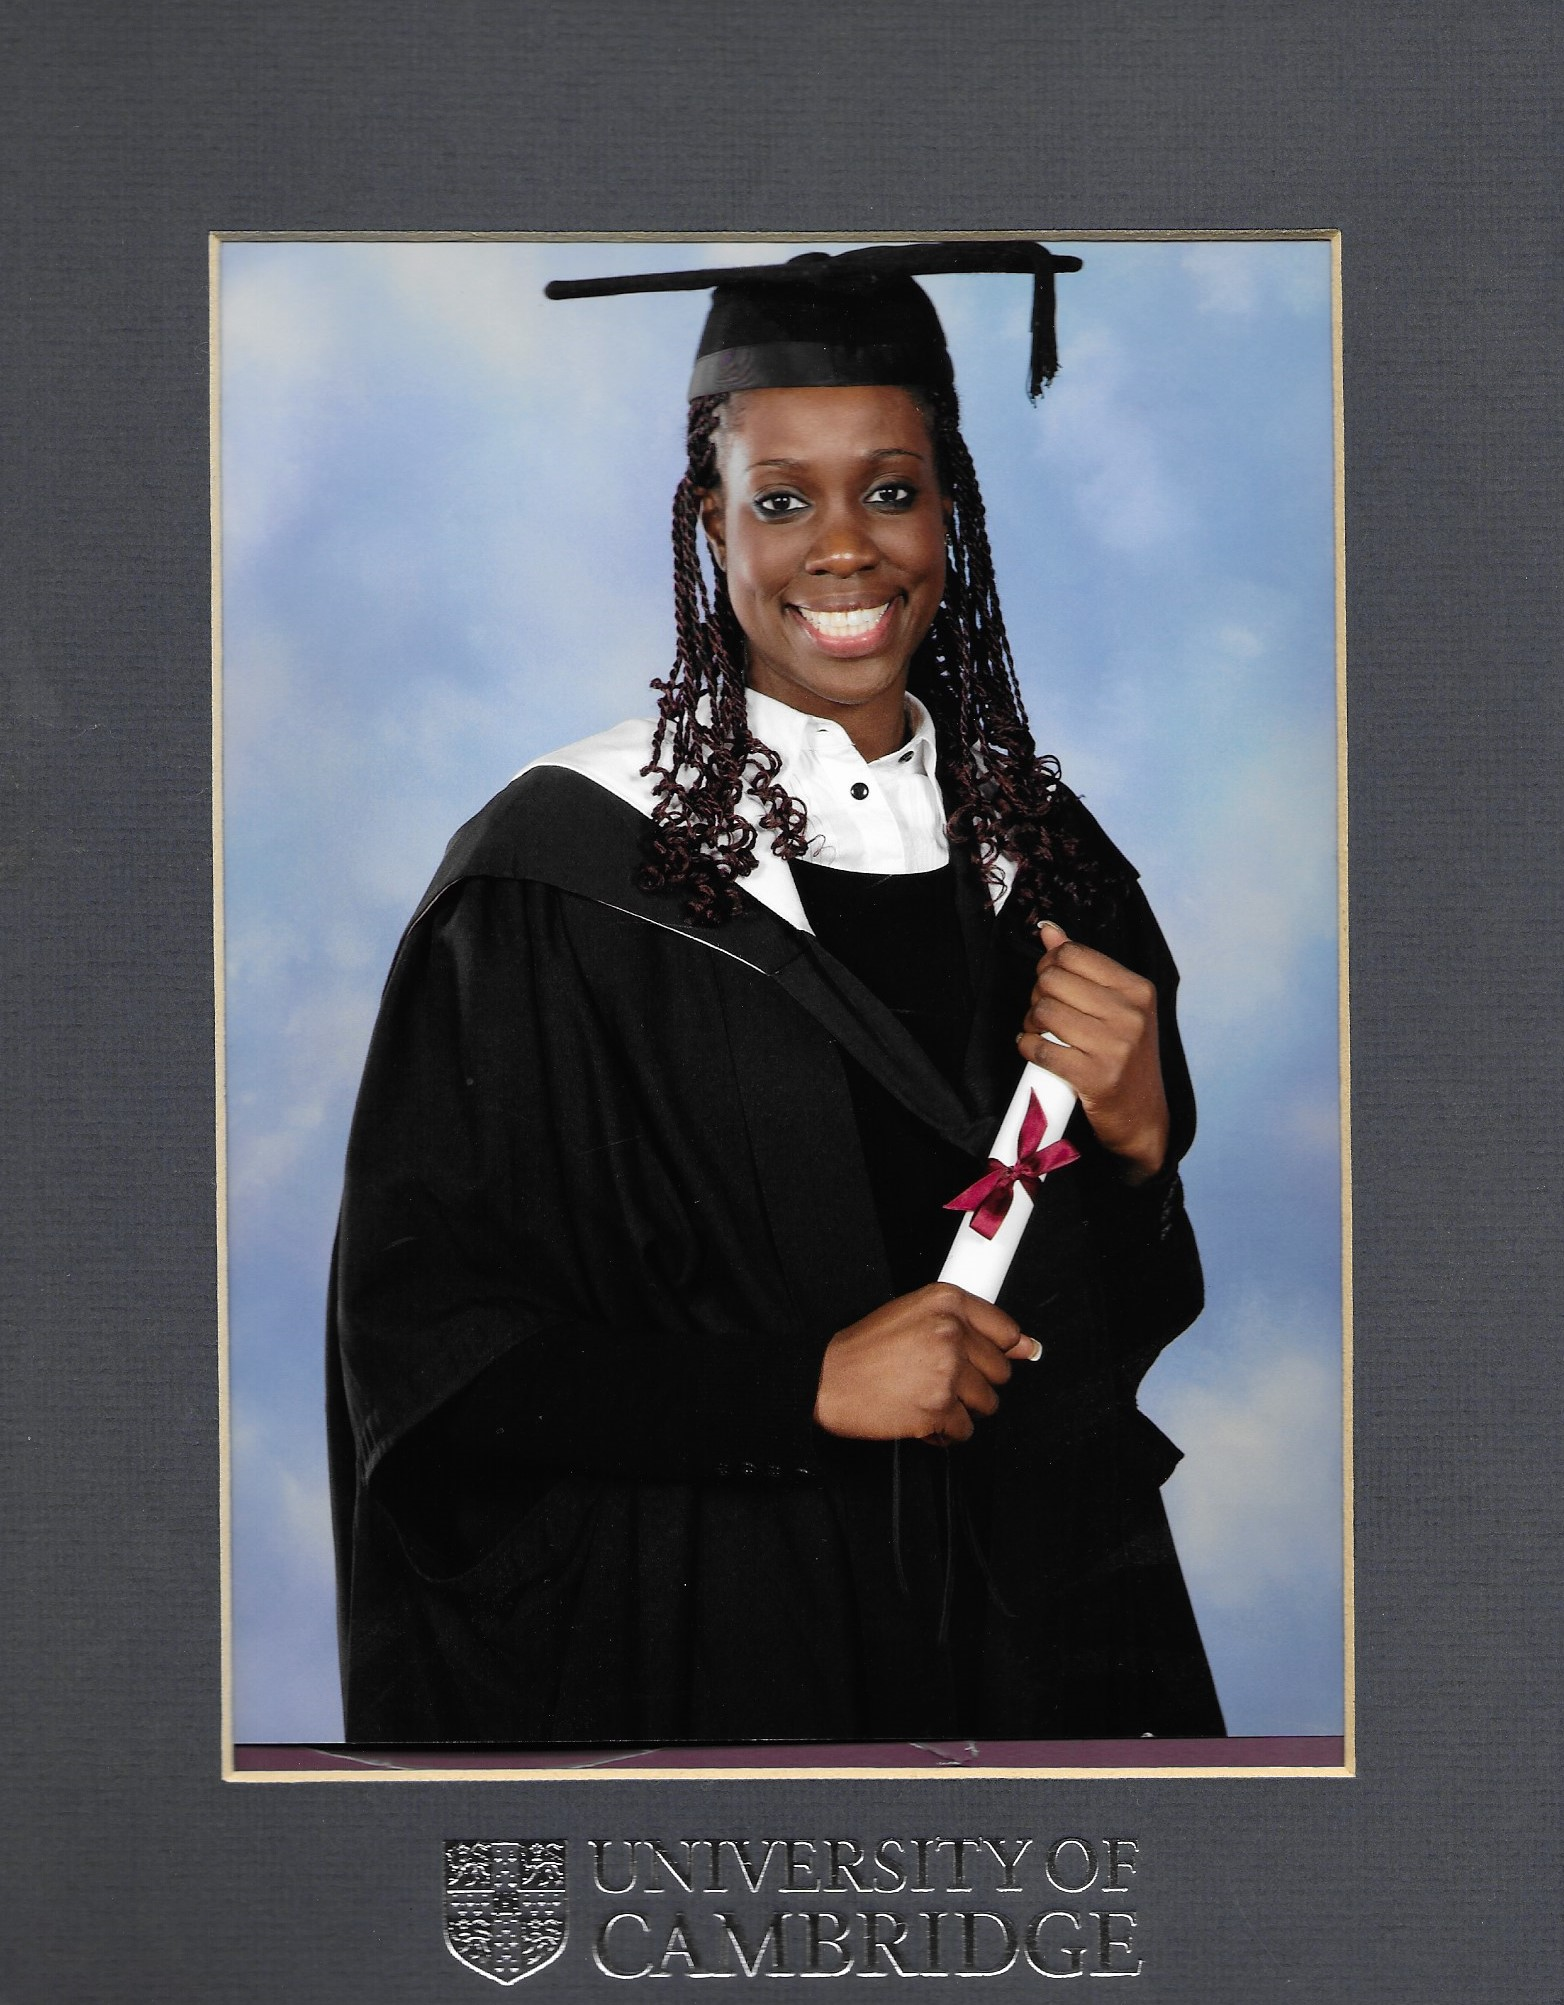 Edleen graduation picture